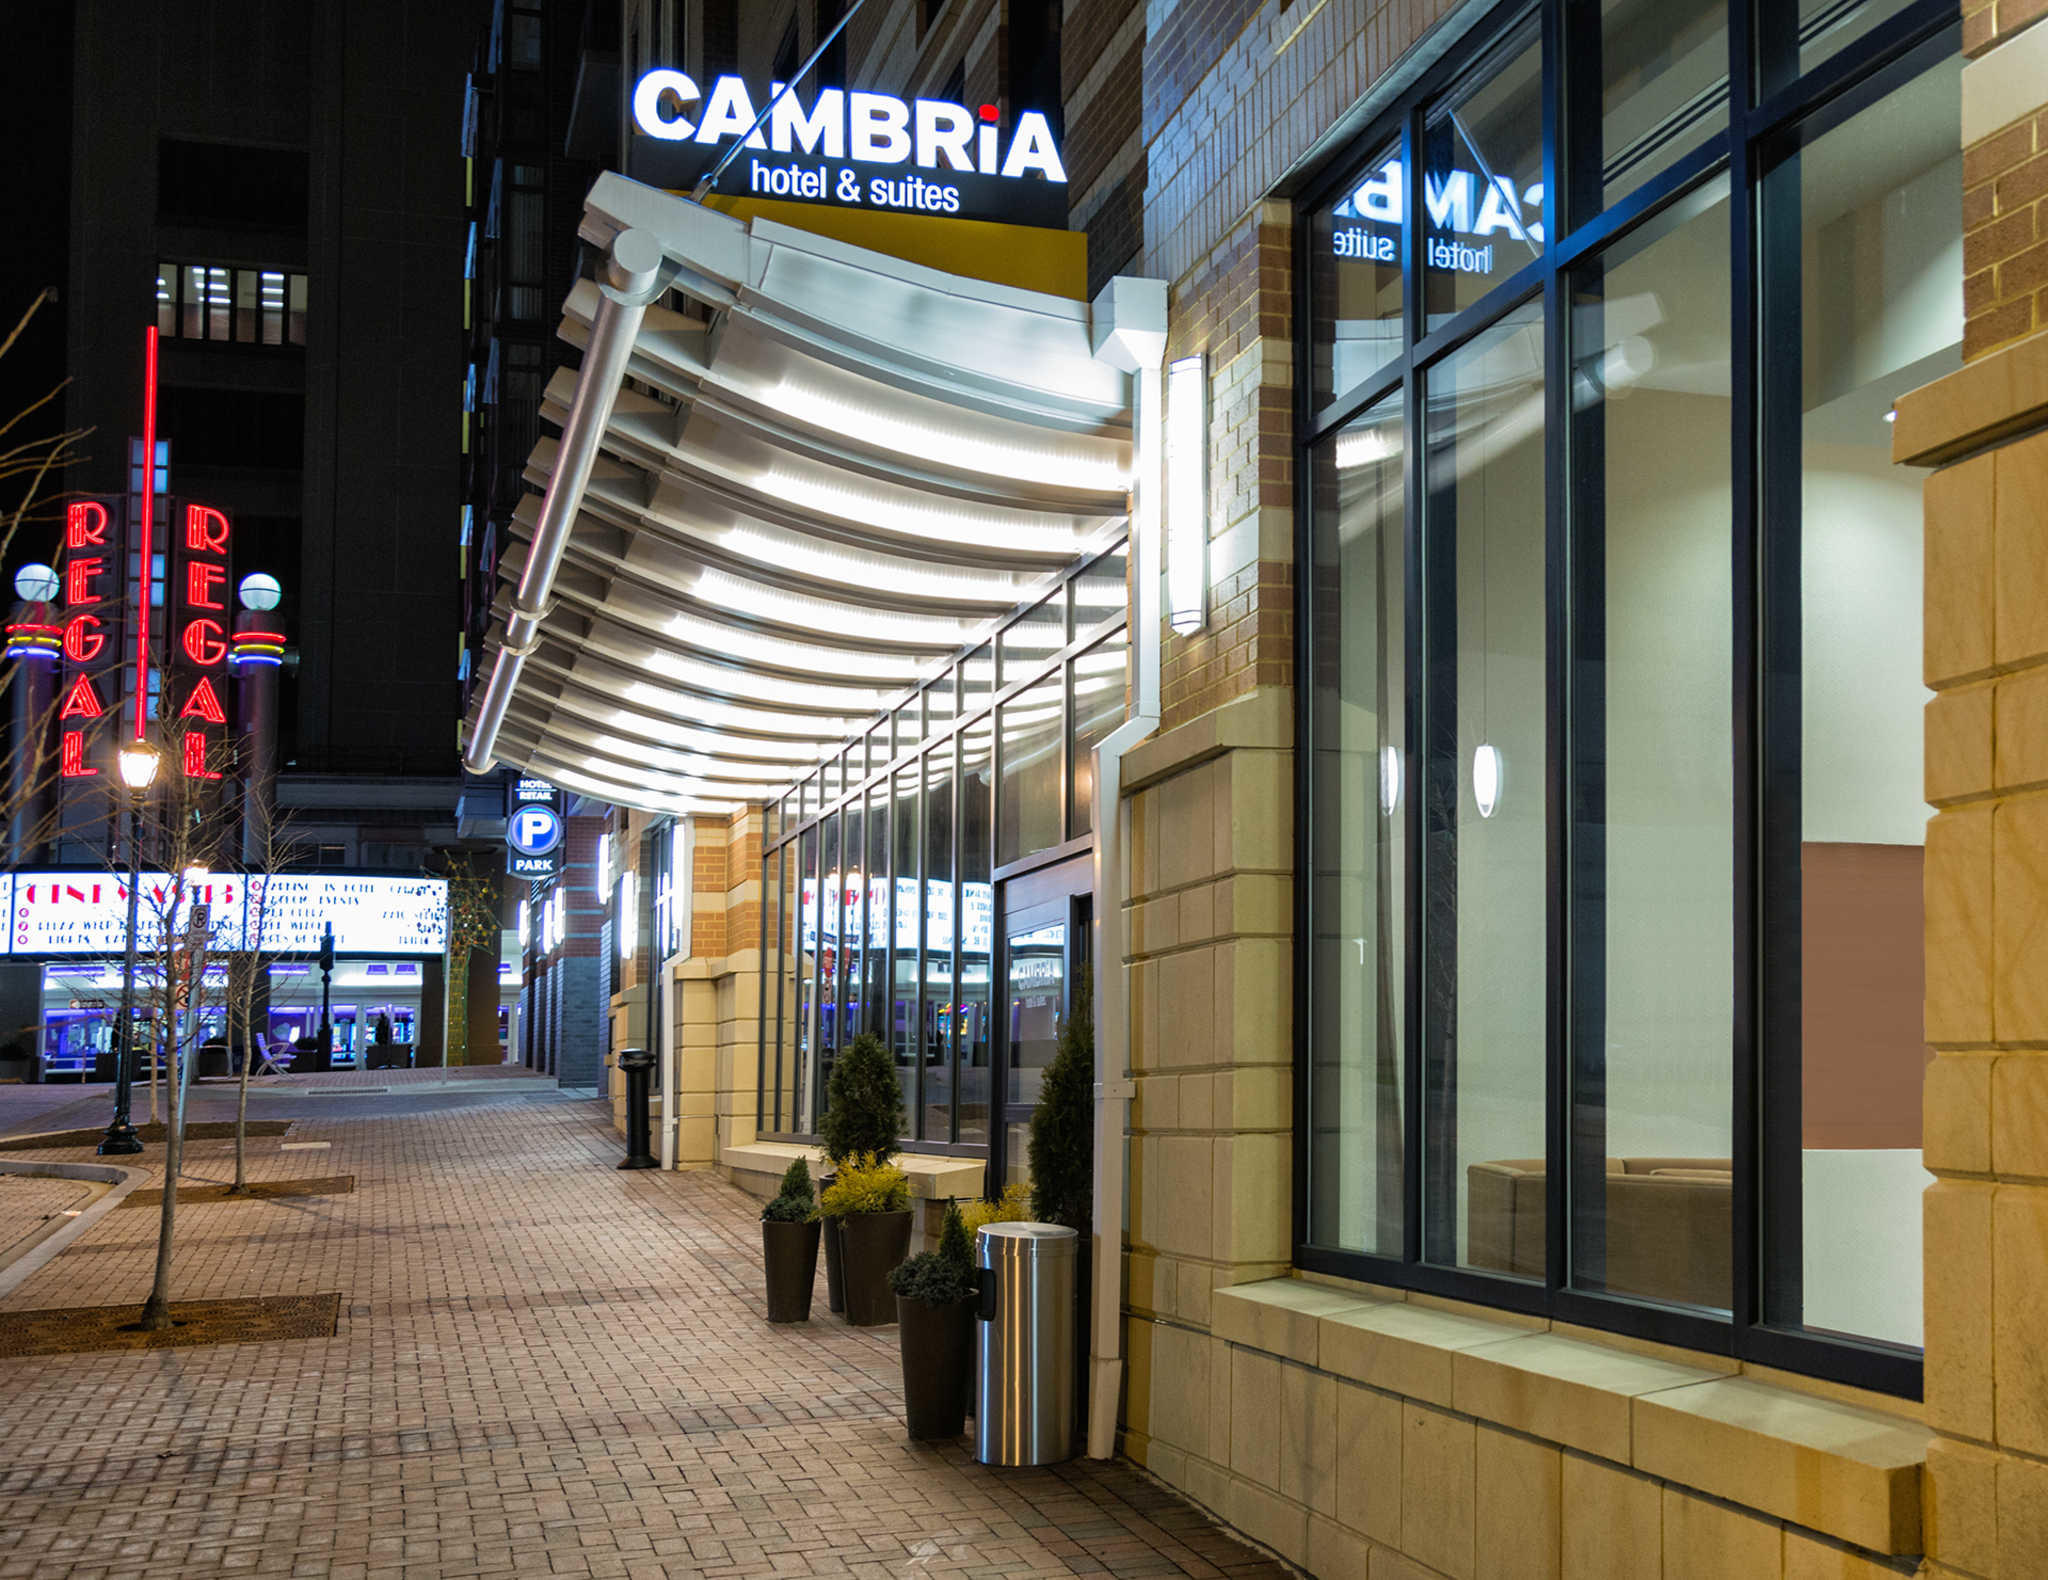 Cambria Hotel Rockville image 3